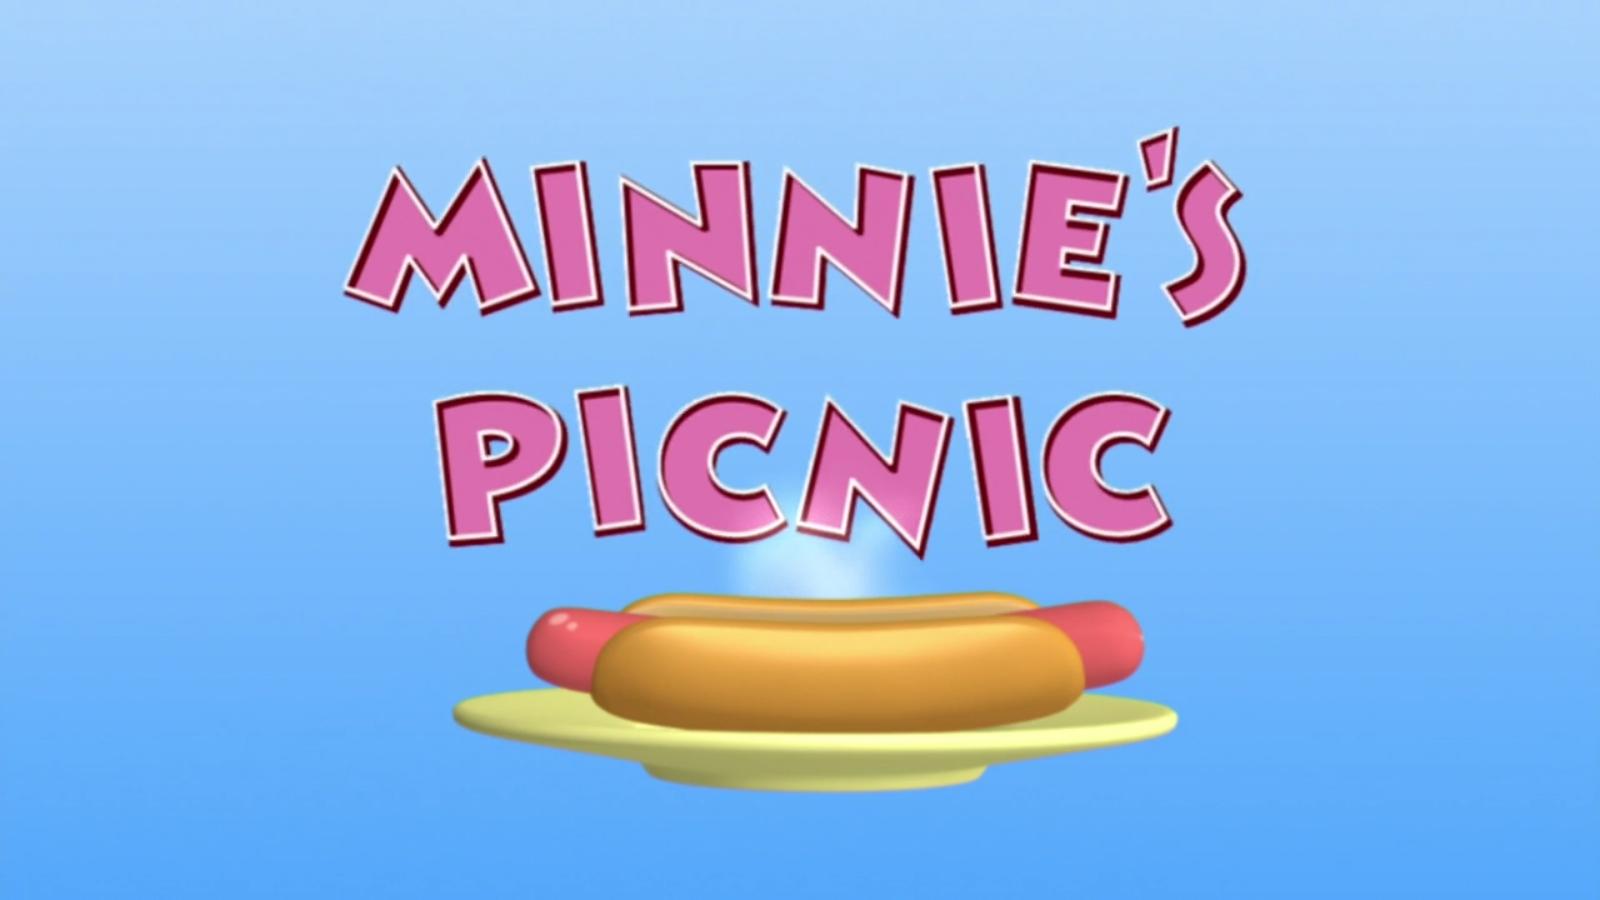 Minnie's Picnic